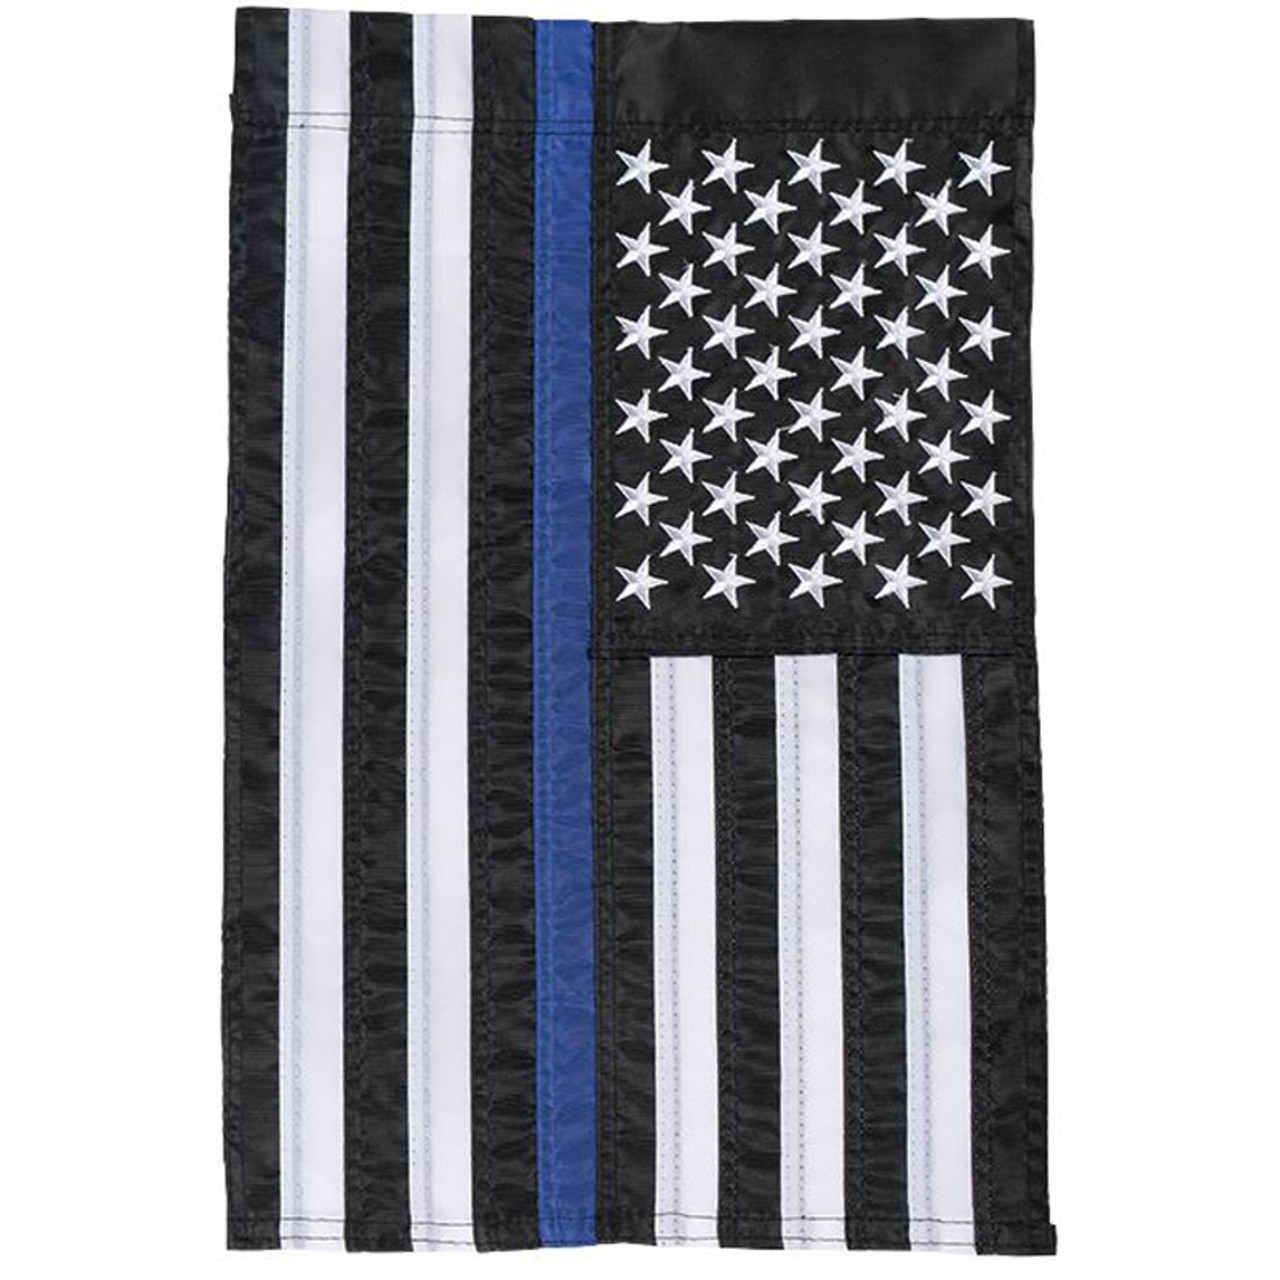 12x18 USA American Flag Sleeved Embroidered Garden Flag USA SHIPPER